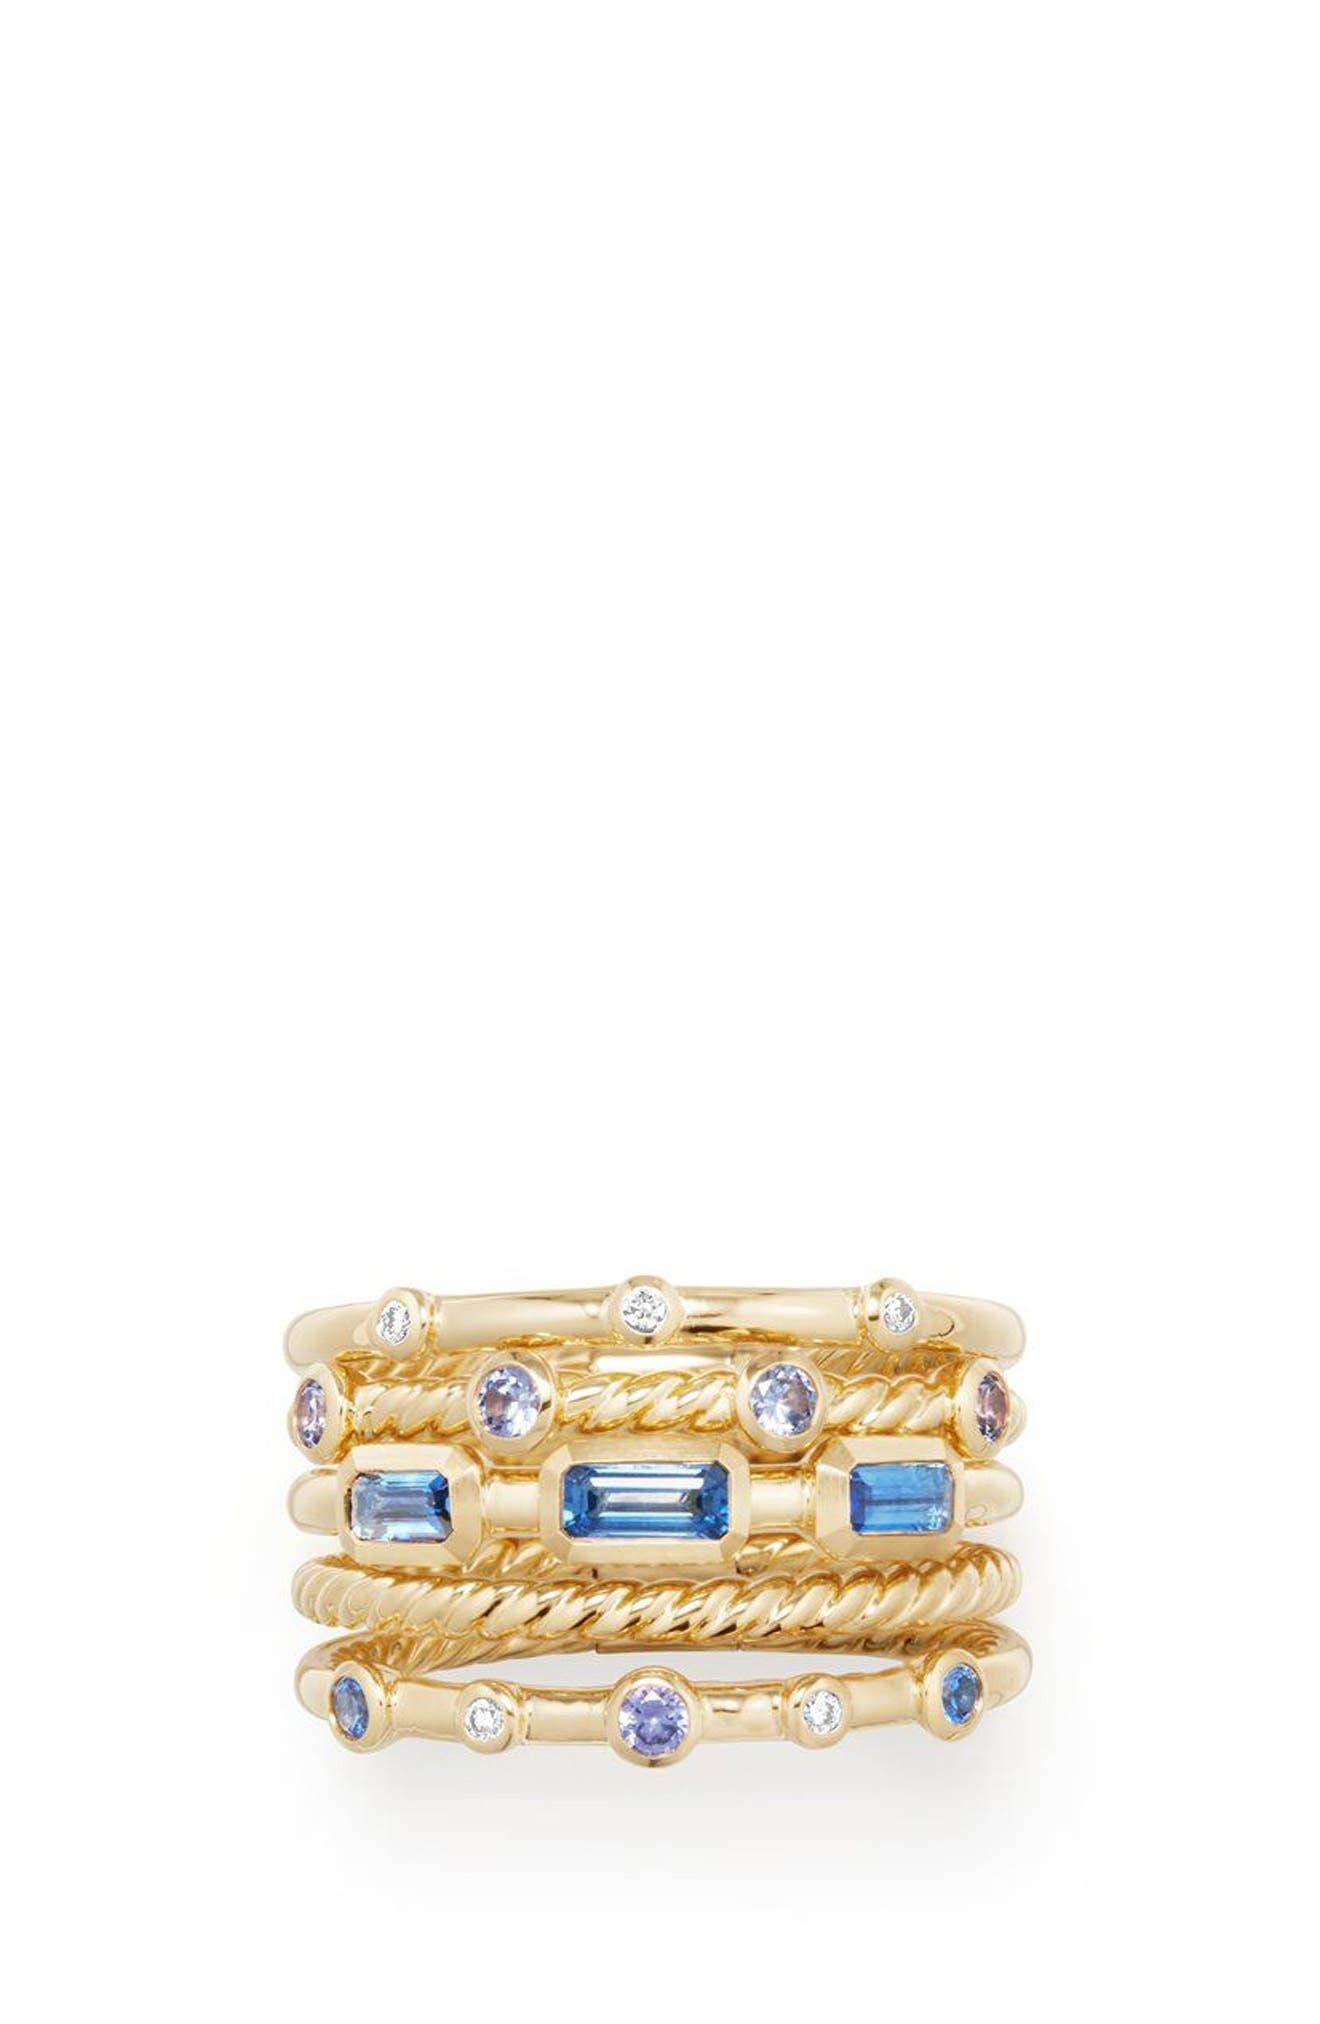 DAVID YURMAN,                             Novella Stack Ring with Diamonds,                             Alternate thumbnail 3, color,                             GOLD/ DIAMOND/ BLUE SAPPHIRE